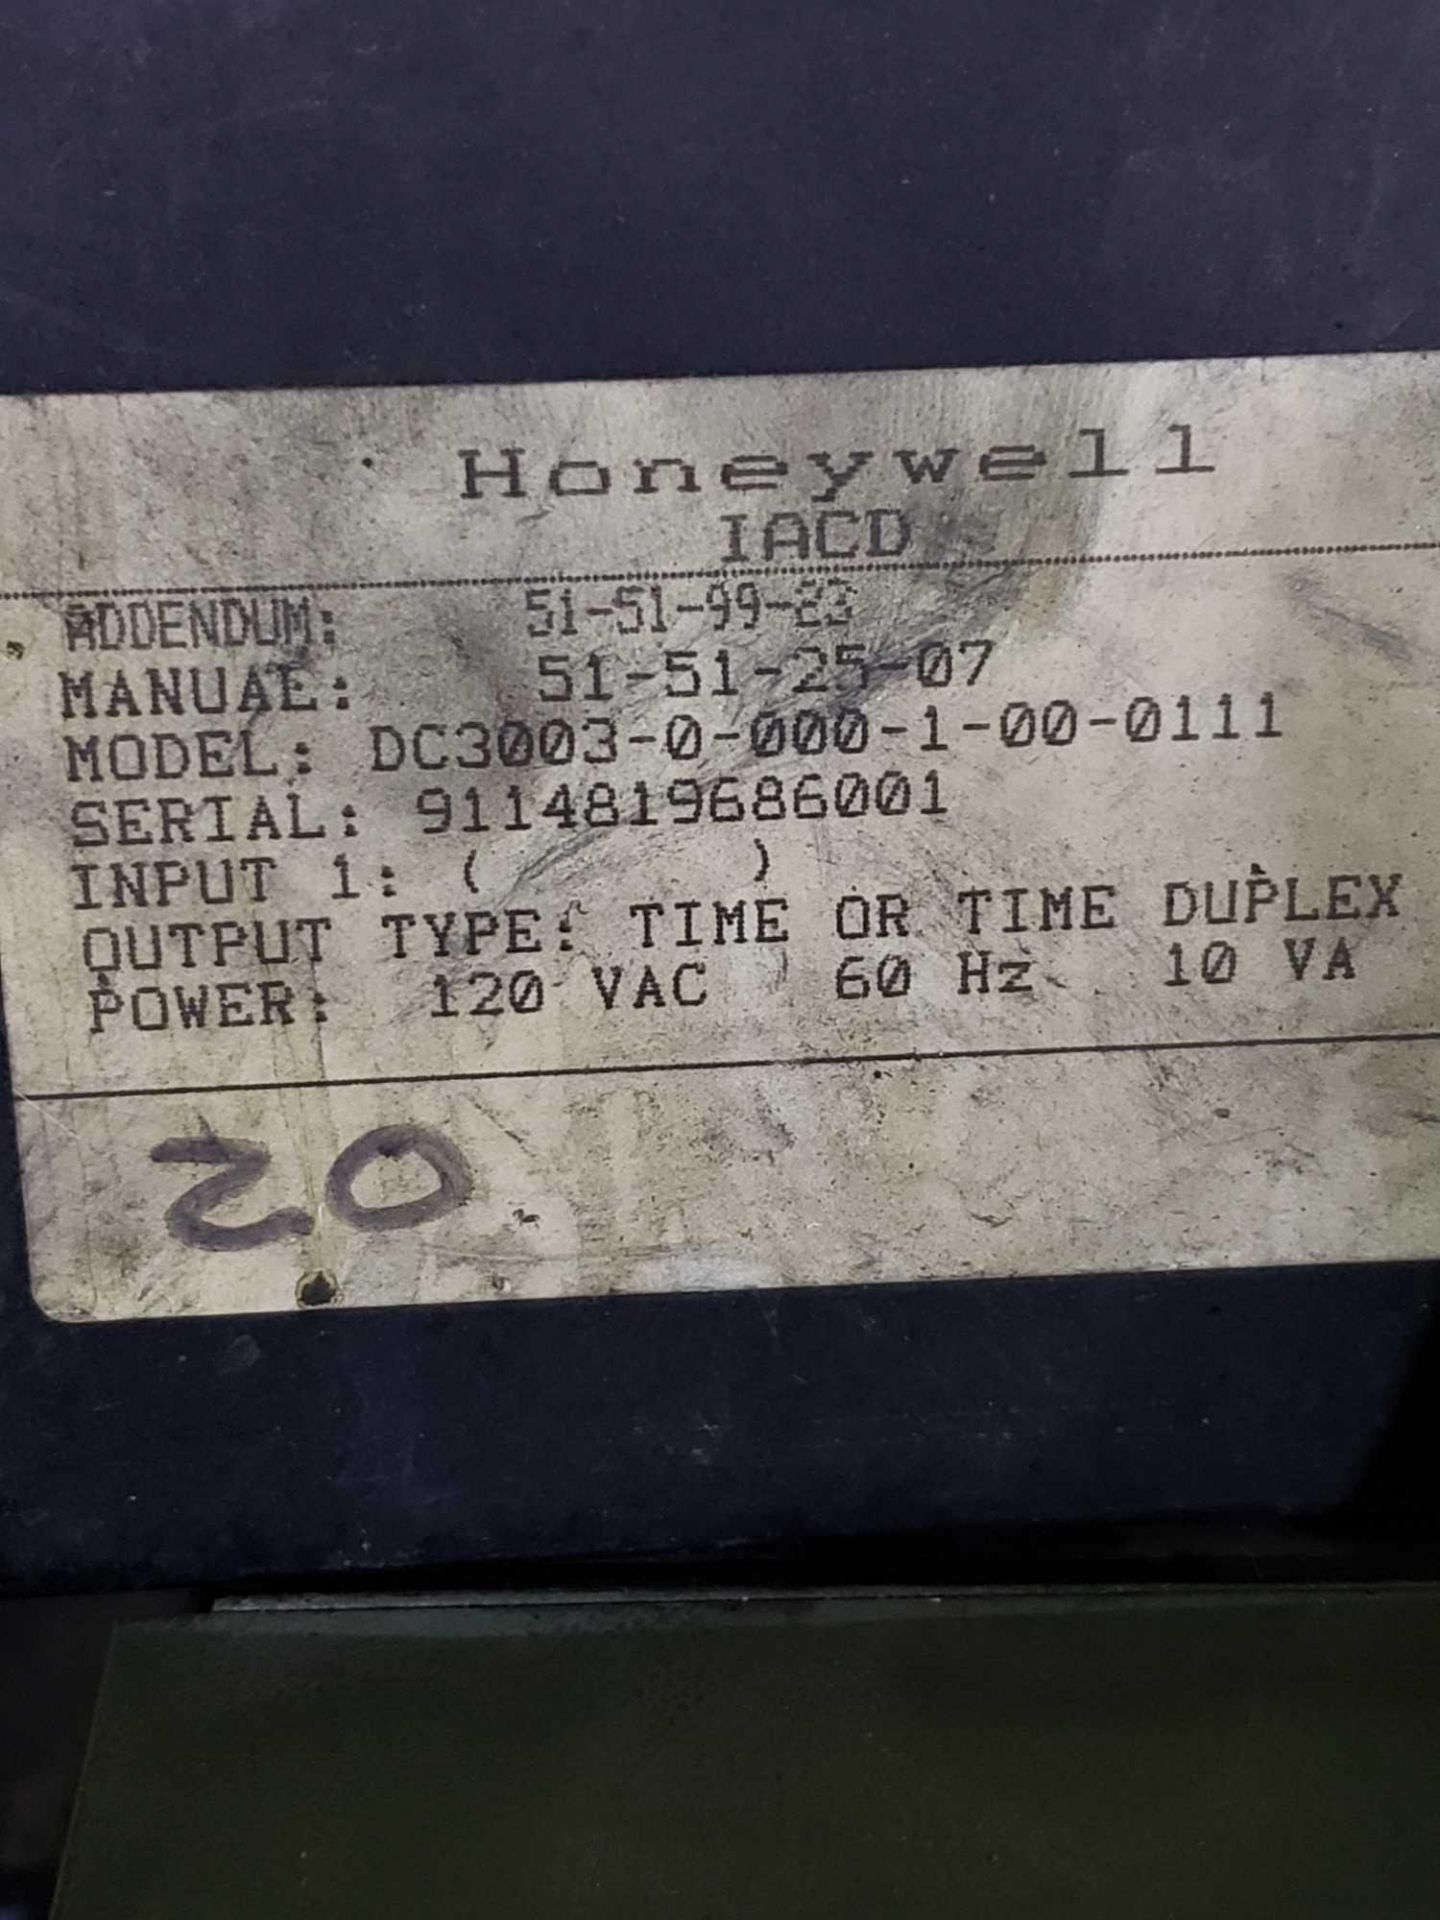 Lot 38 - Qty 3 Honeywell Model DC3003-0-000-1-00-0111. Used.